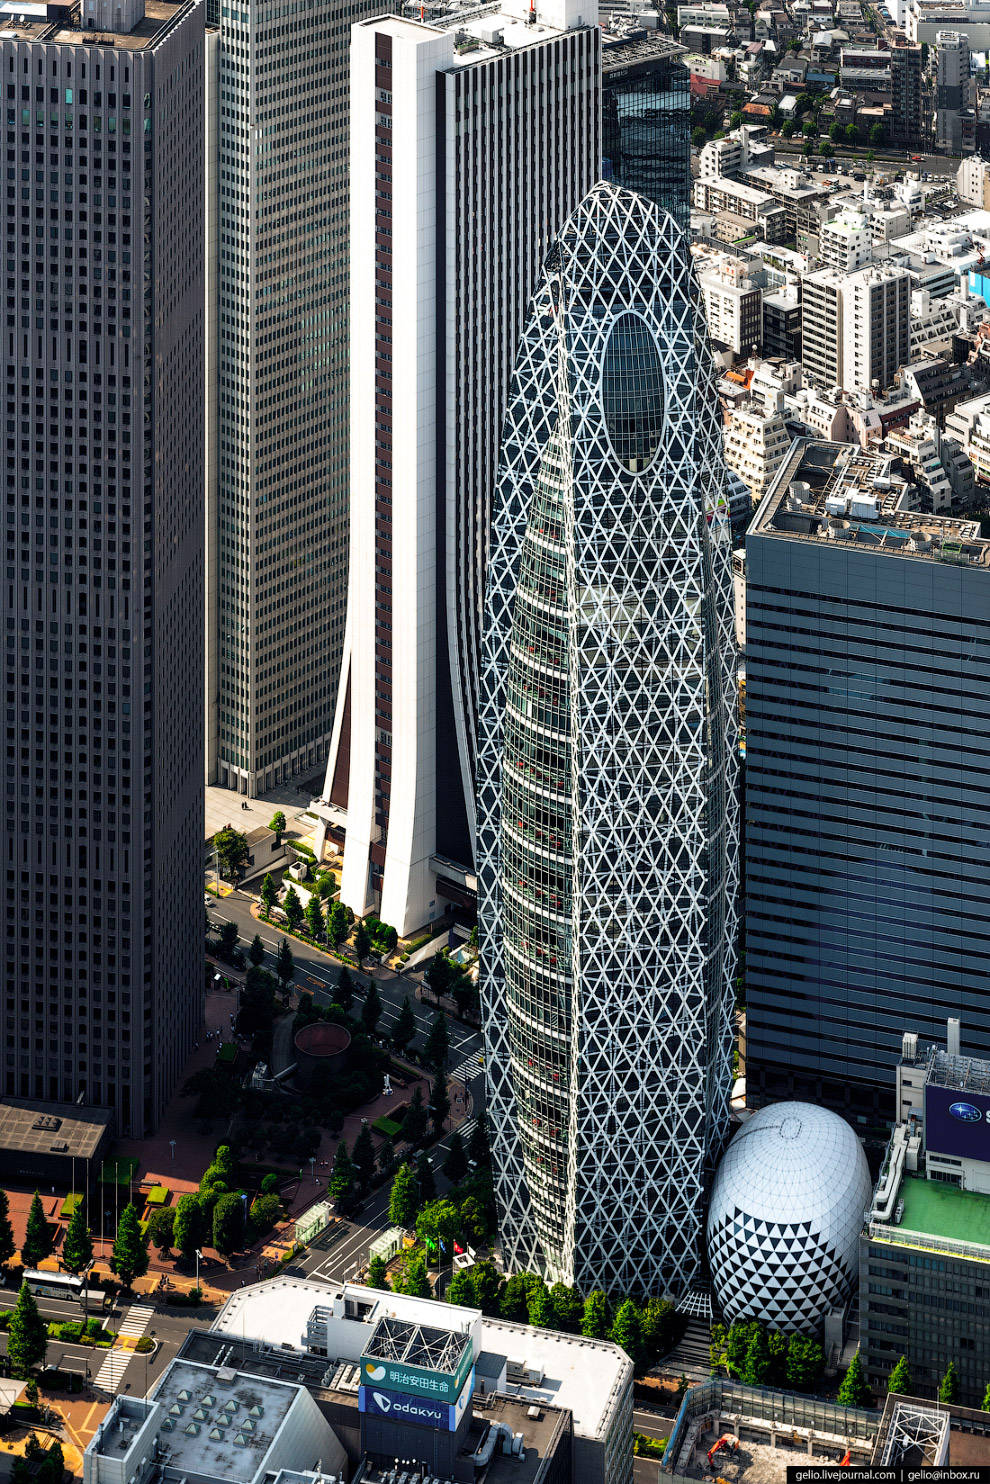 Башня-Кокон Модэ Гакуэн (Mode Gakuen Cocoon Tower)